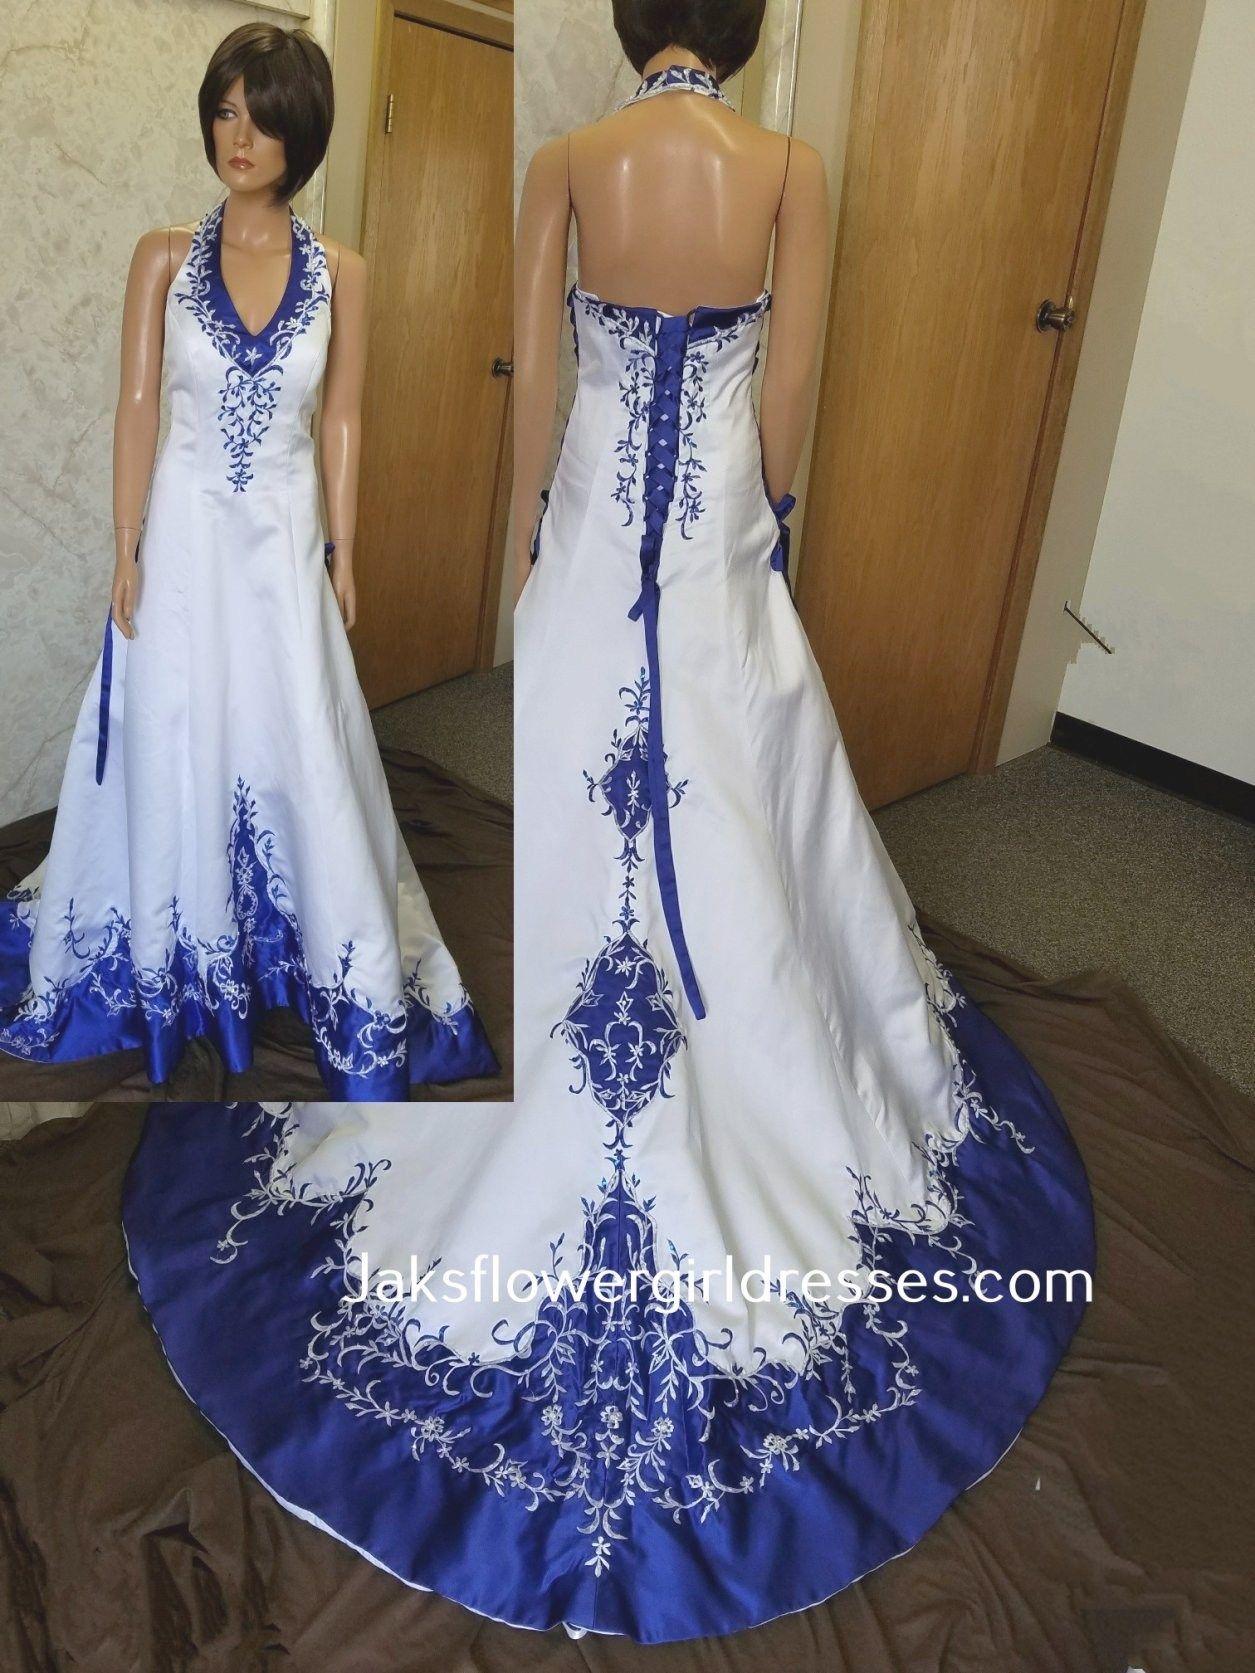 42 Charming Royal Blue And White Wedding Dresses Best Inspiration Blue Wedding Dress Royal Shapewear For Wedding Dress White Wedding Dresses